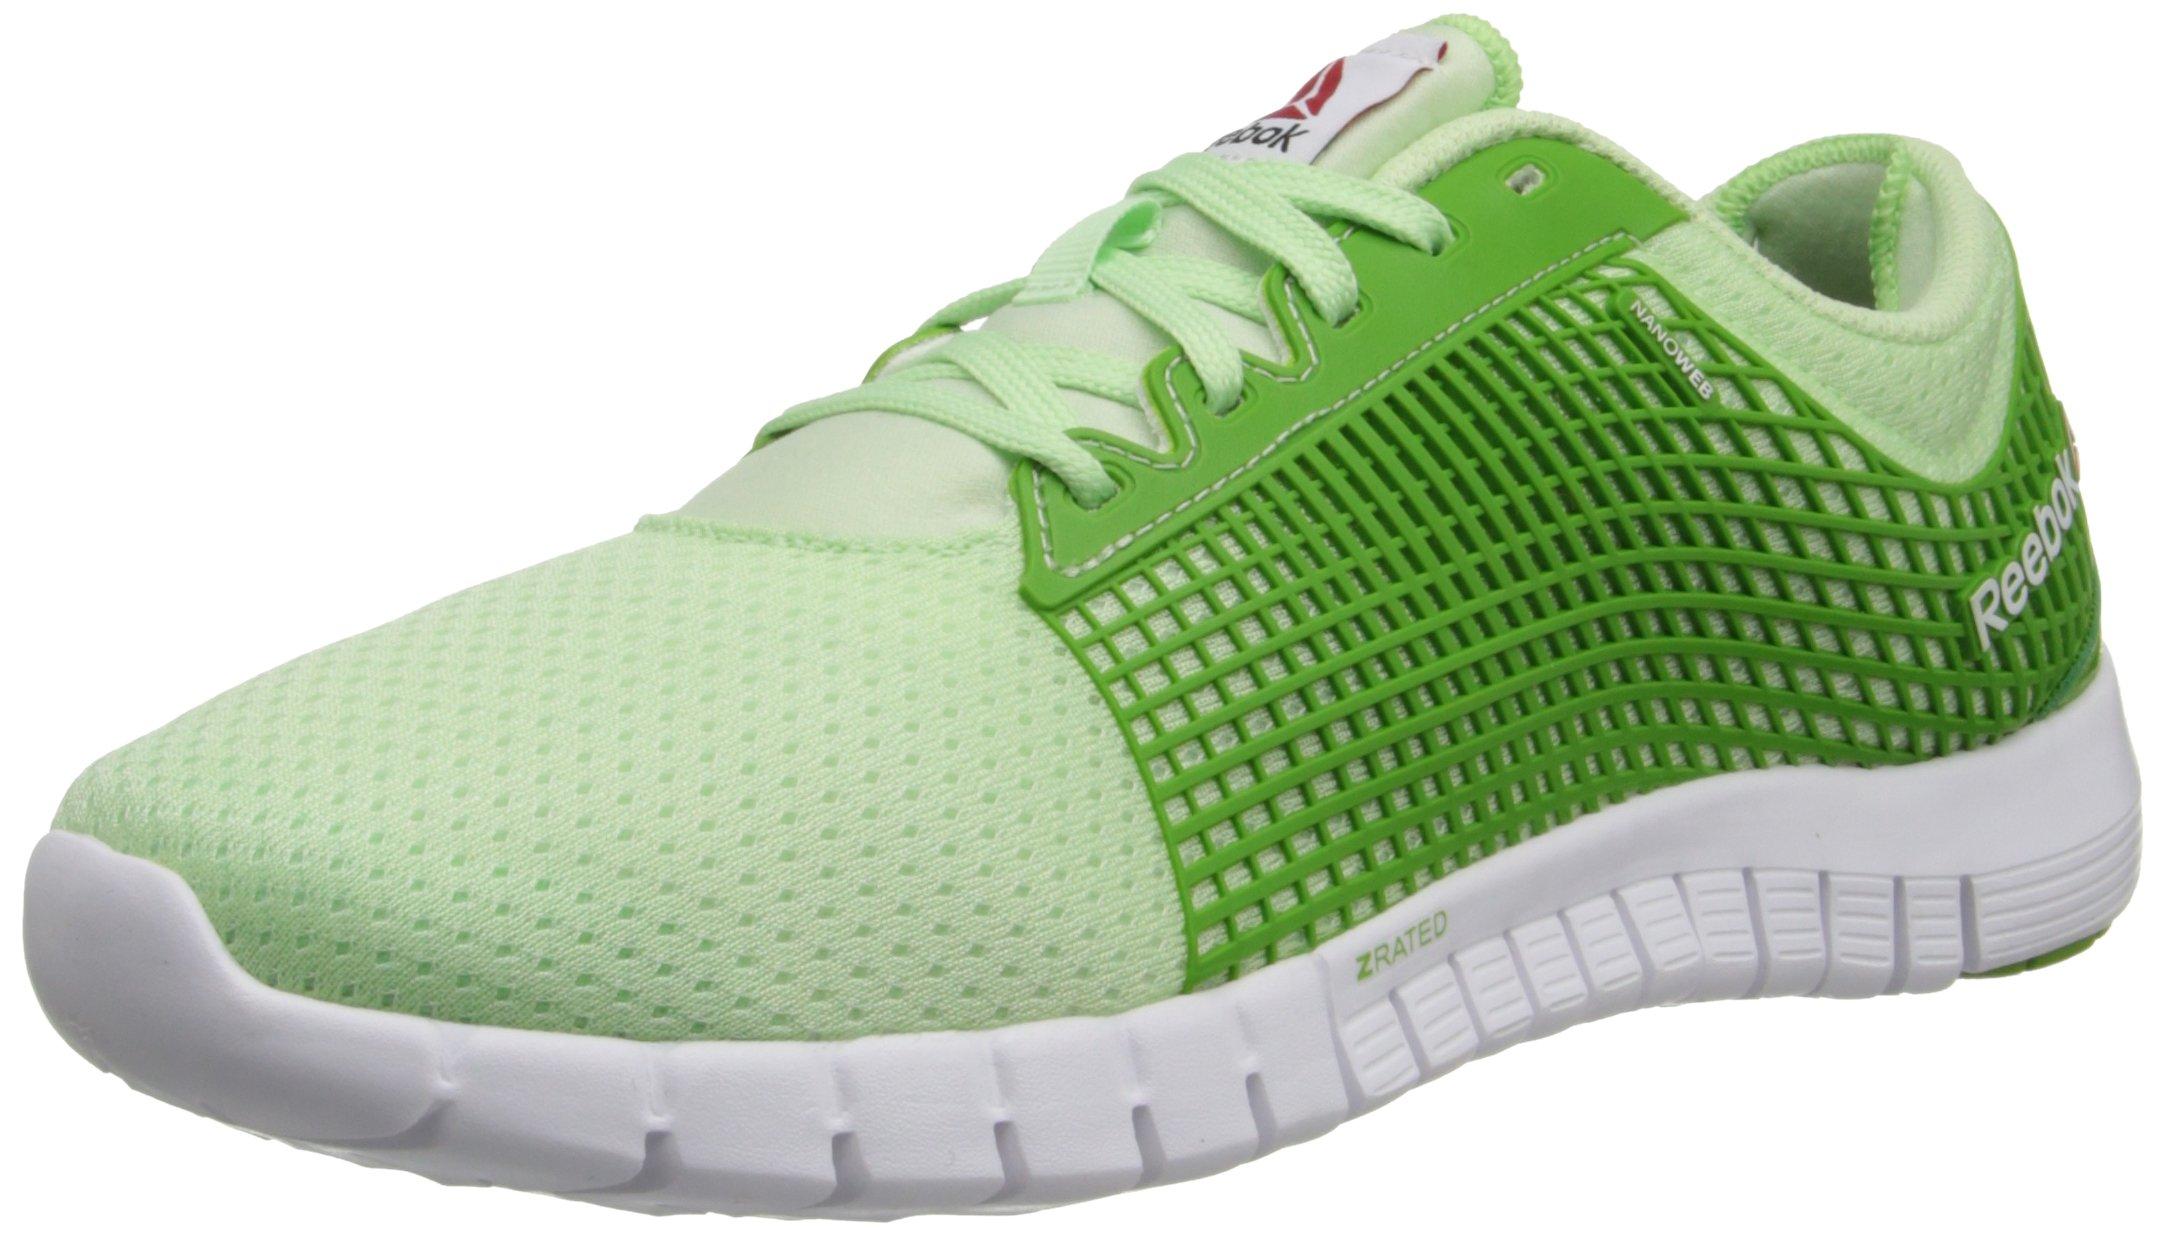 Reebok Women's ZQuick Running Shoe,Sea Glass/Green Smash/White,6 M US by Reebok